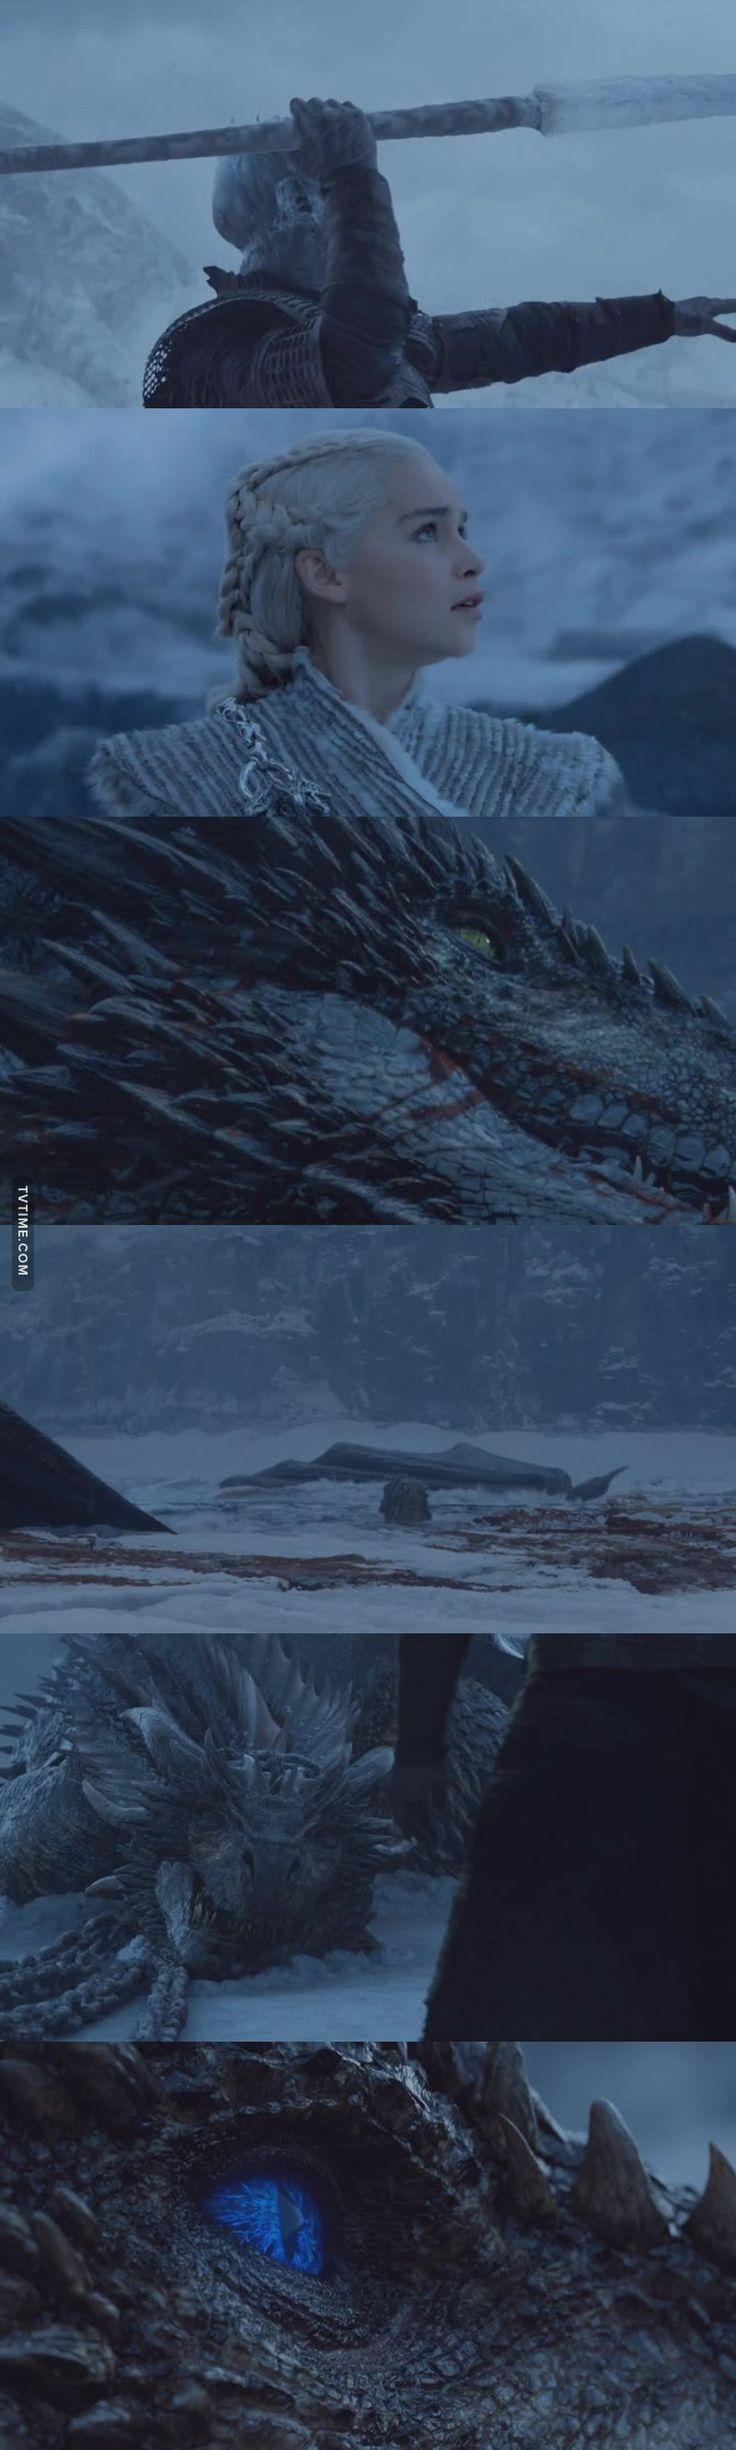 It's bad enough when they kill off characters, but when they start killing the animals, I'm like NOOOOOOOOO!!!!